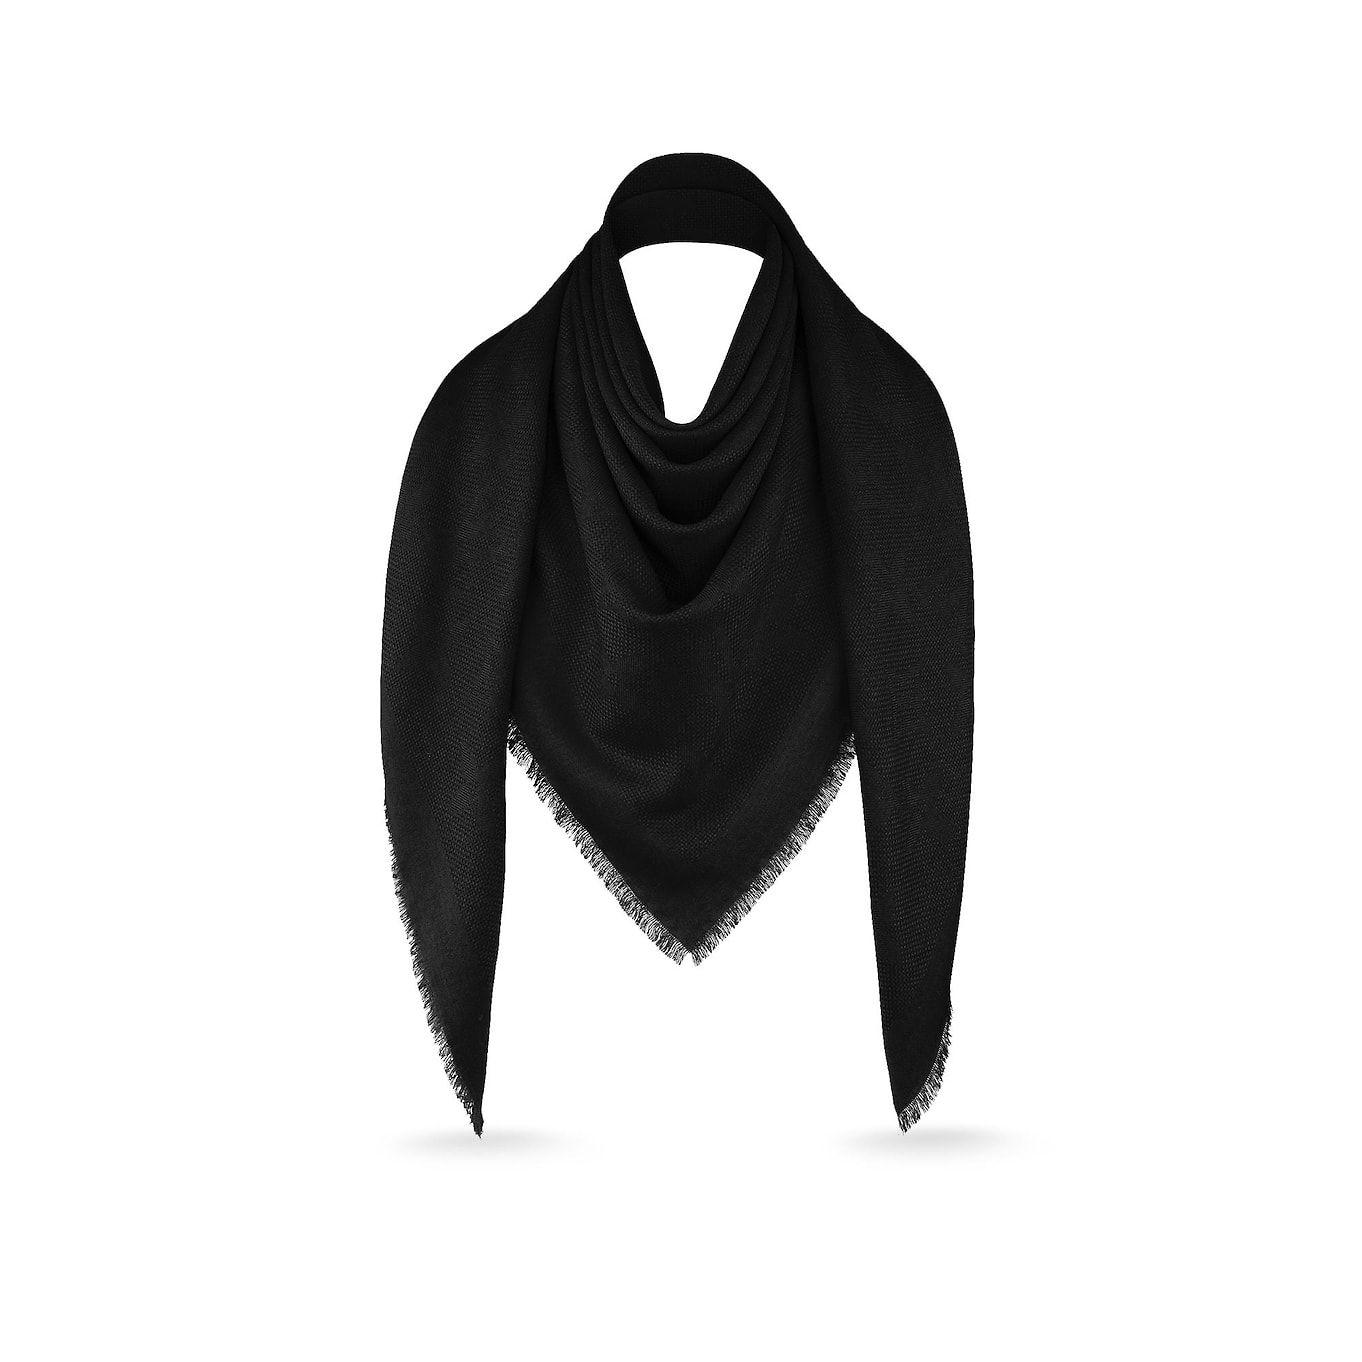 Accessories Scarves Shawls More Natte Monogram Shawl Louis Vuitton Louis Vuitton Vuitton Louis Vuitton Handbags